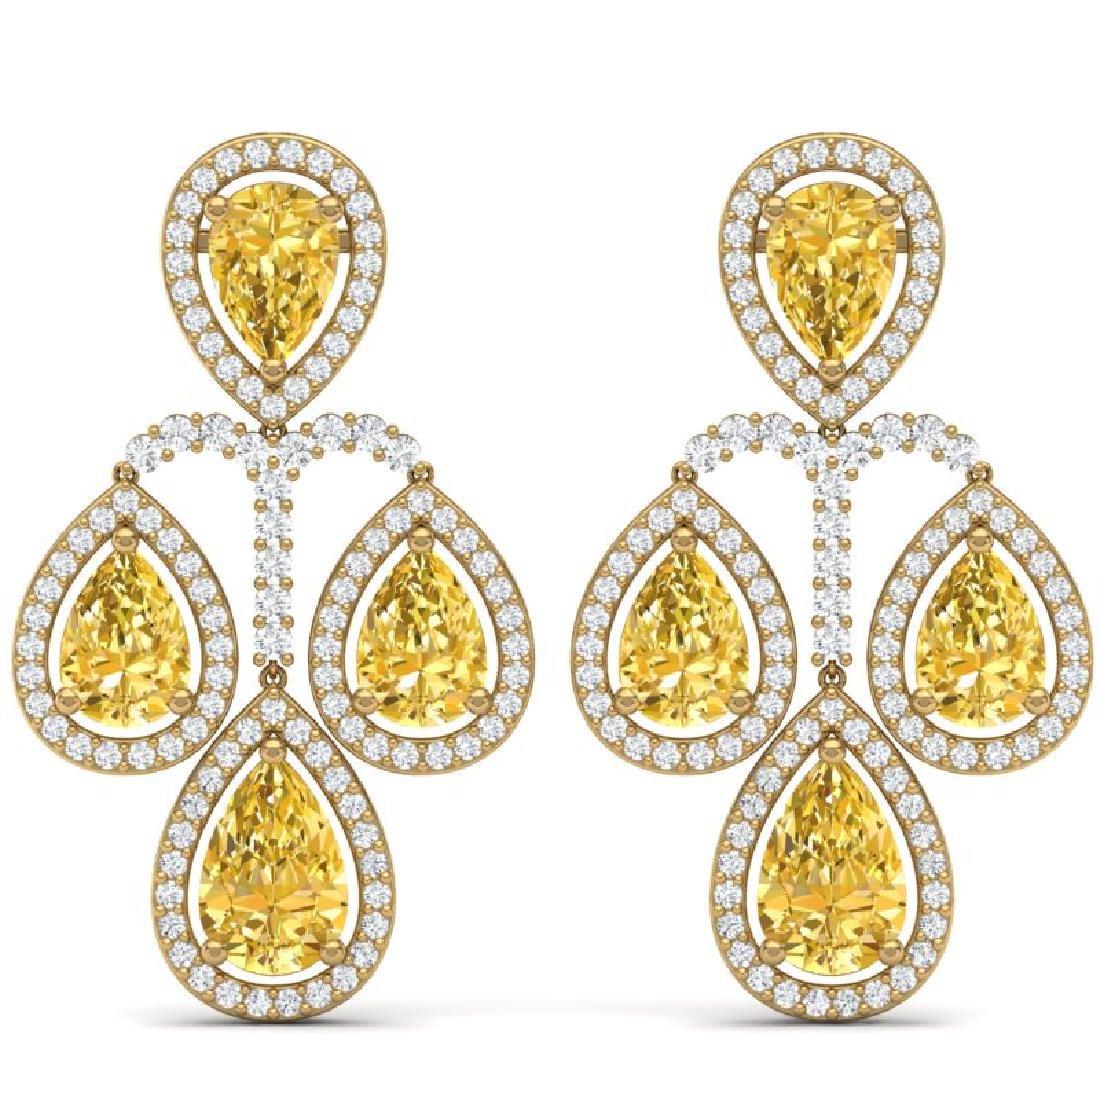 27.85 CTW Royalty Canary Citrine & VS Diamond Earrings